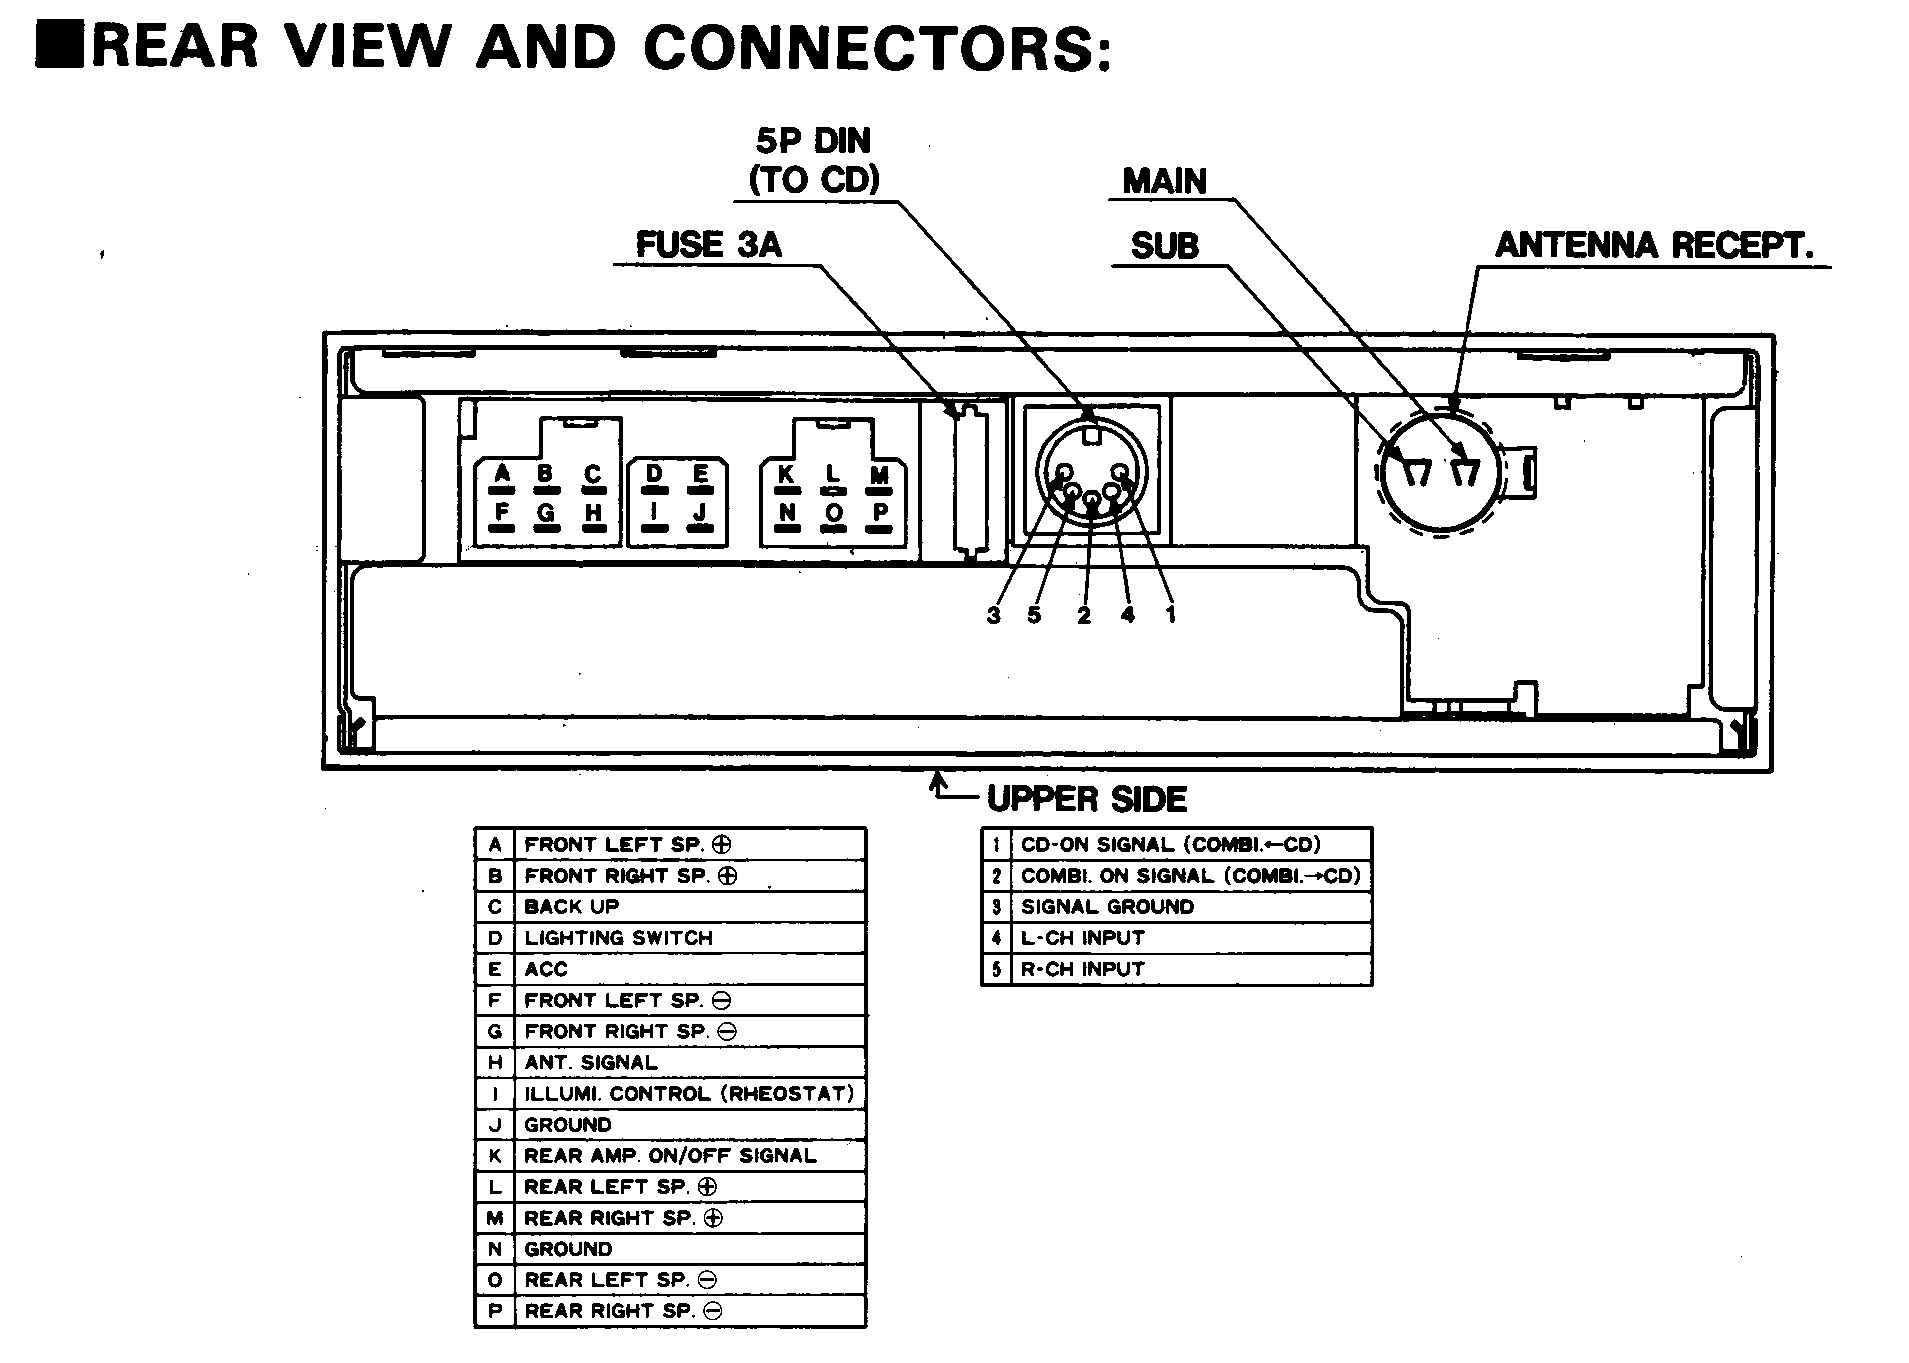 Car Stereo Amp Wiring Diagram Car Audio Wiring Diagrams Pioneer Stereo Diagram with Radio In Of Car Stereo Amp Wiring Diagram